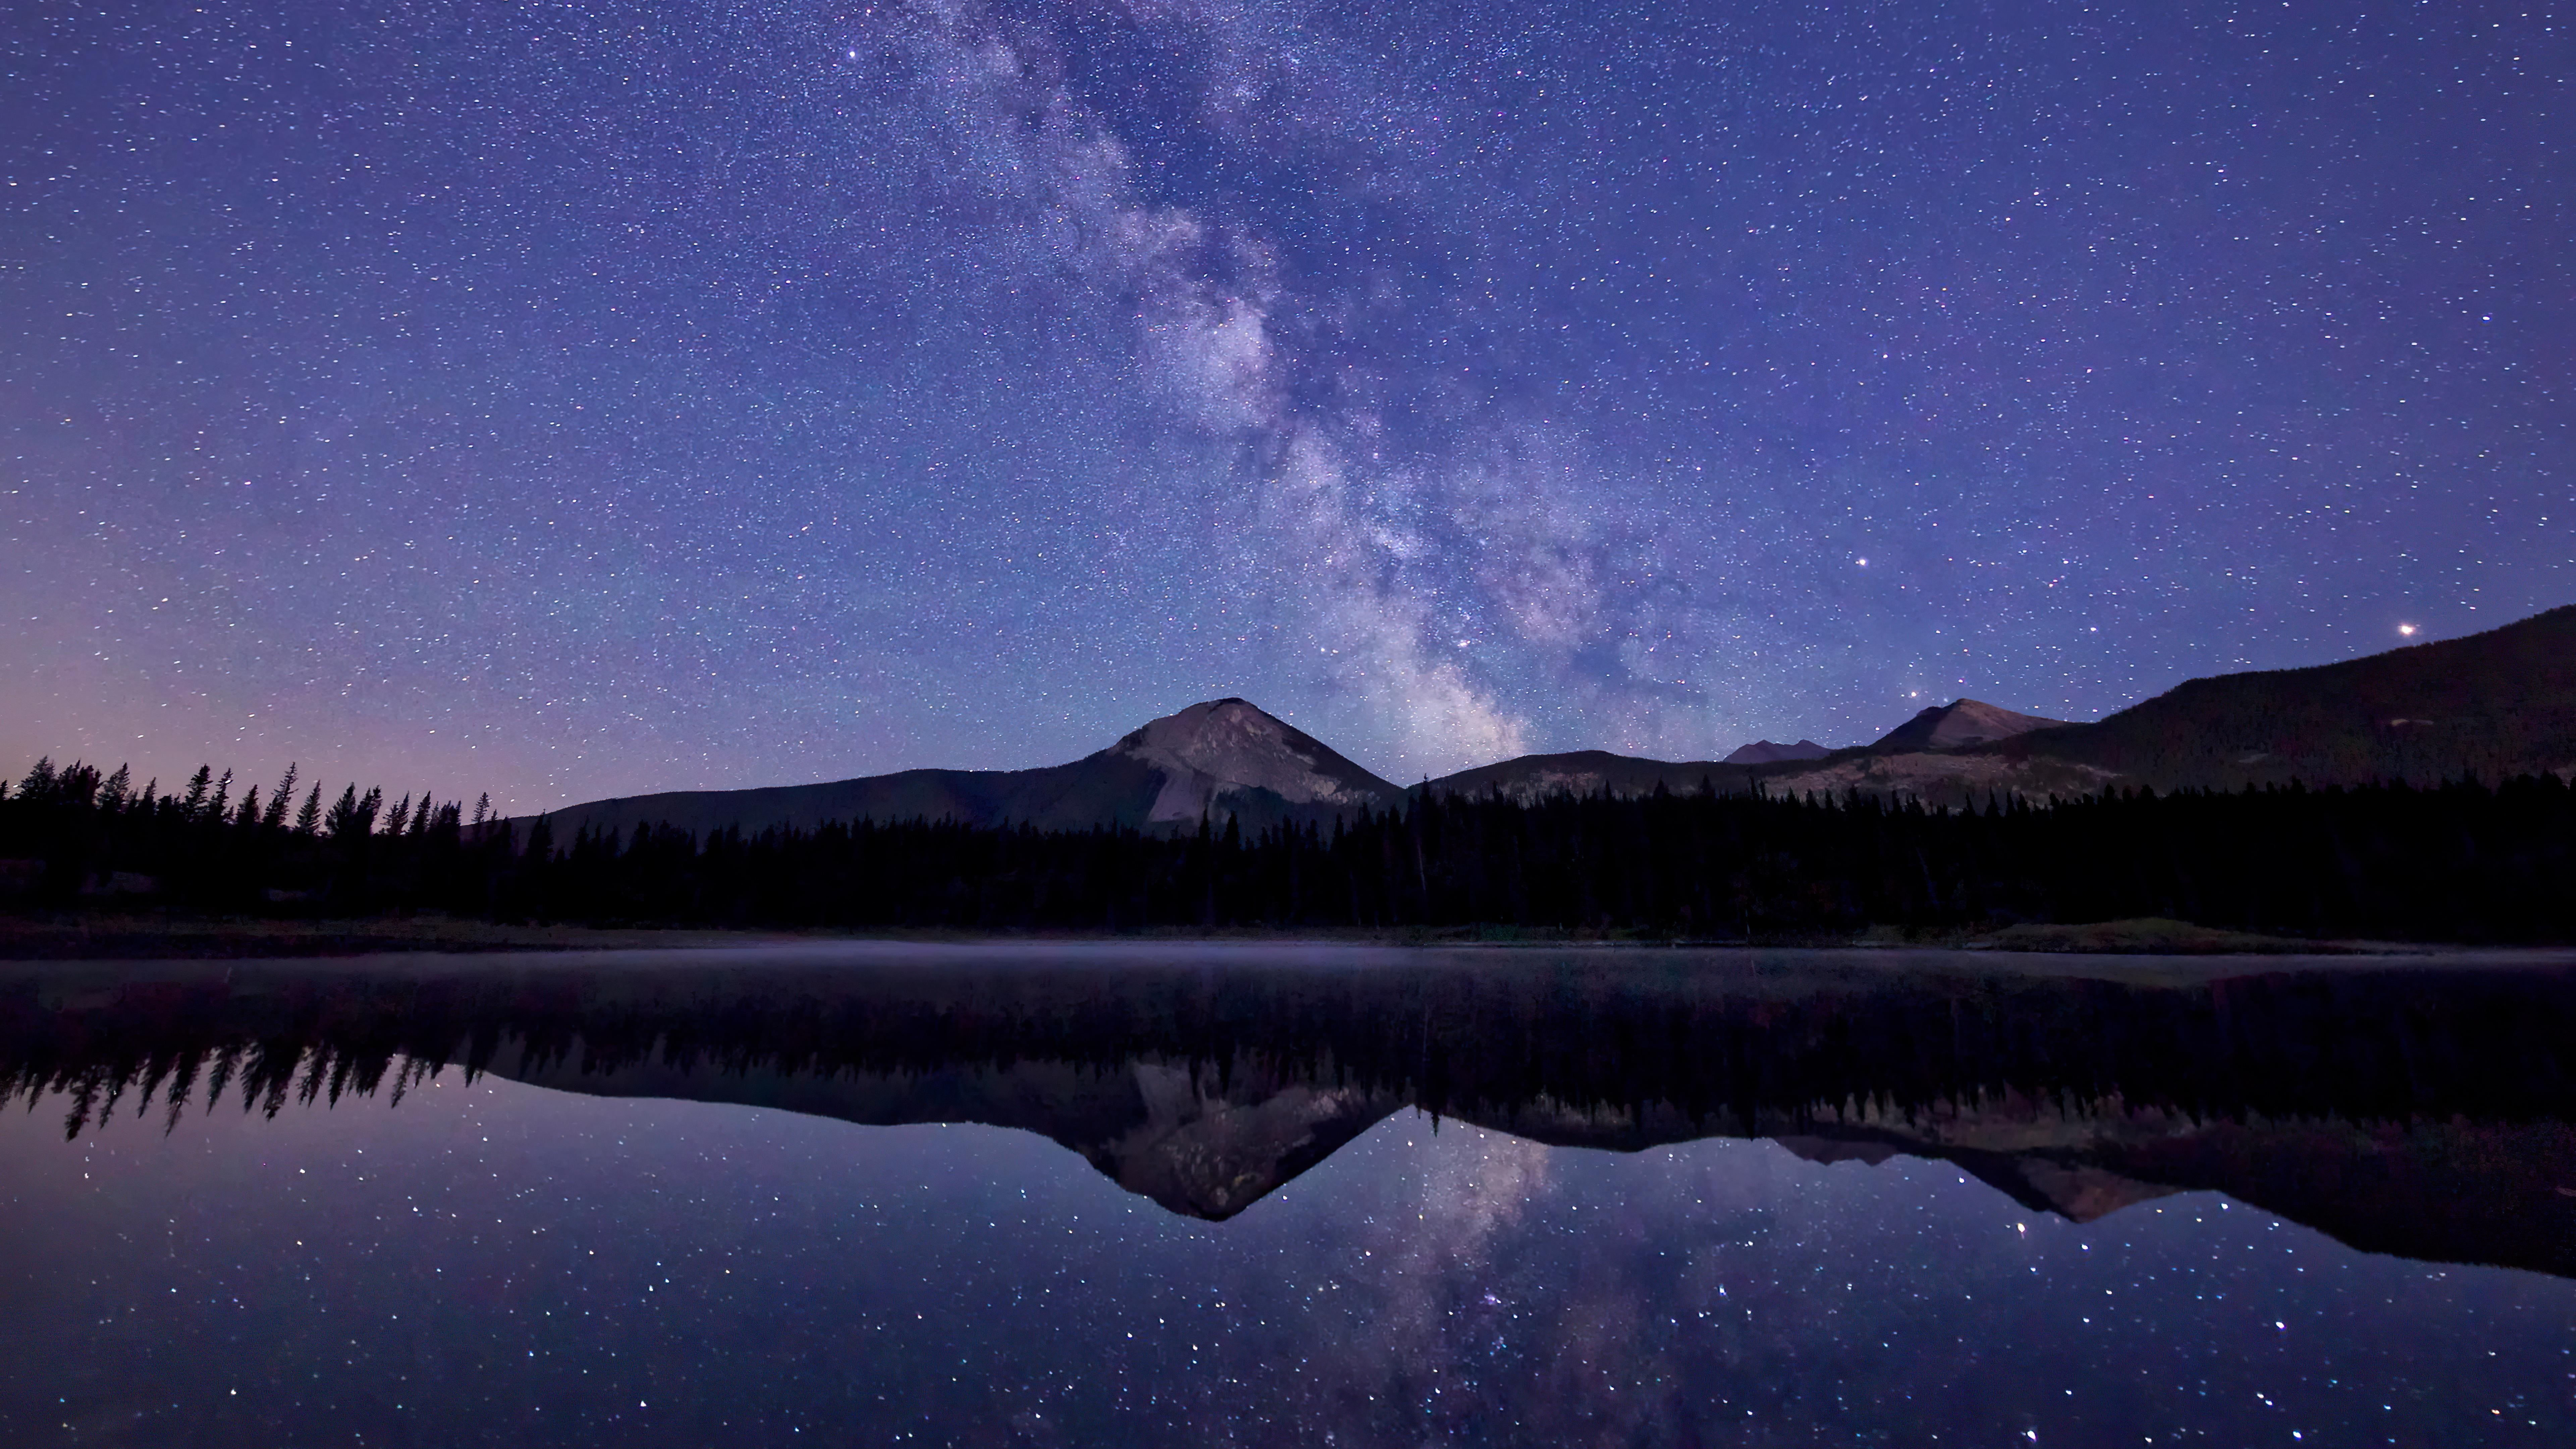 reflections-of-stars-on-sea-8k-jf.jpg